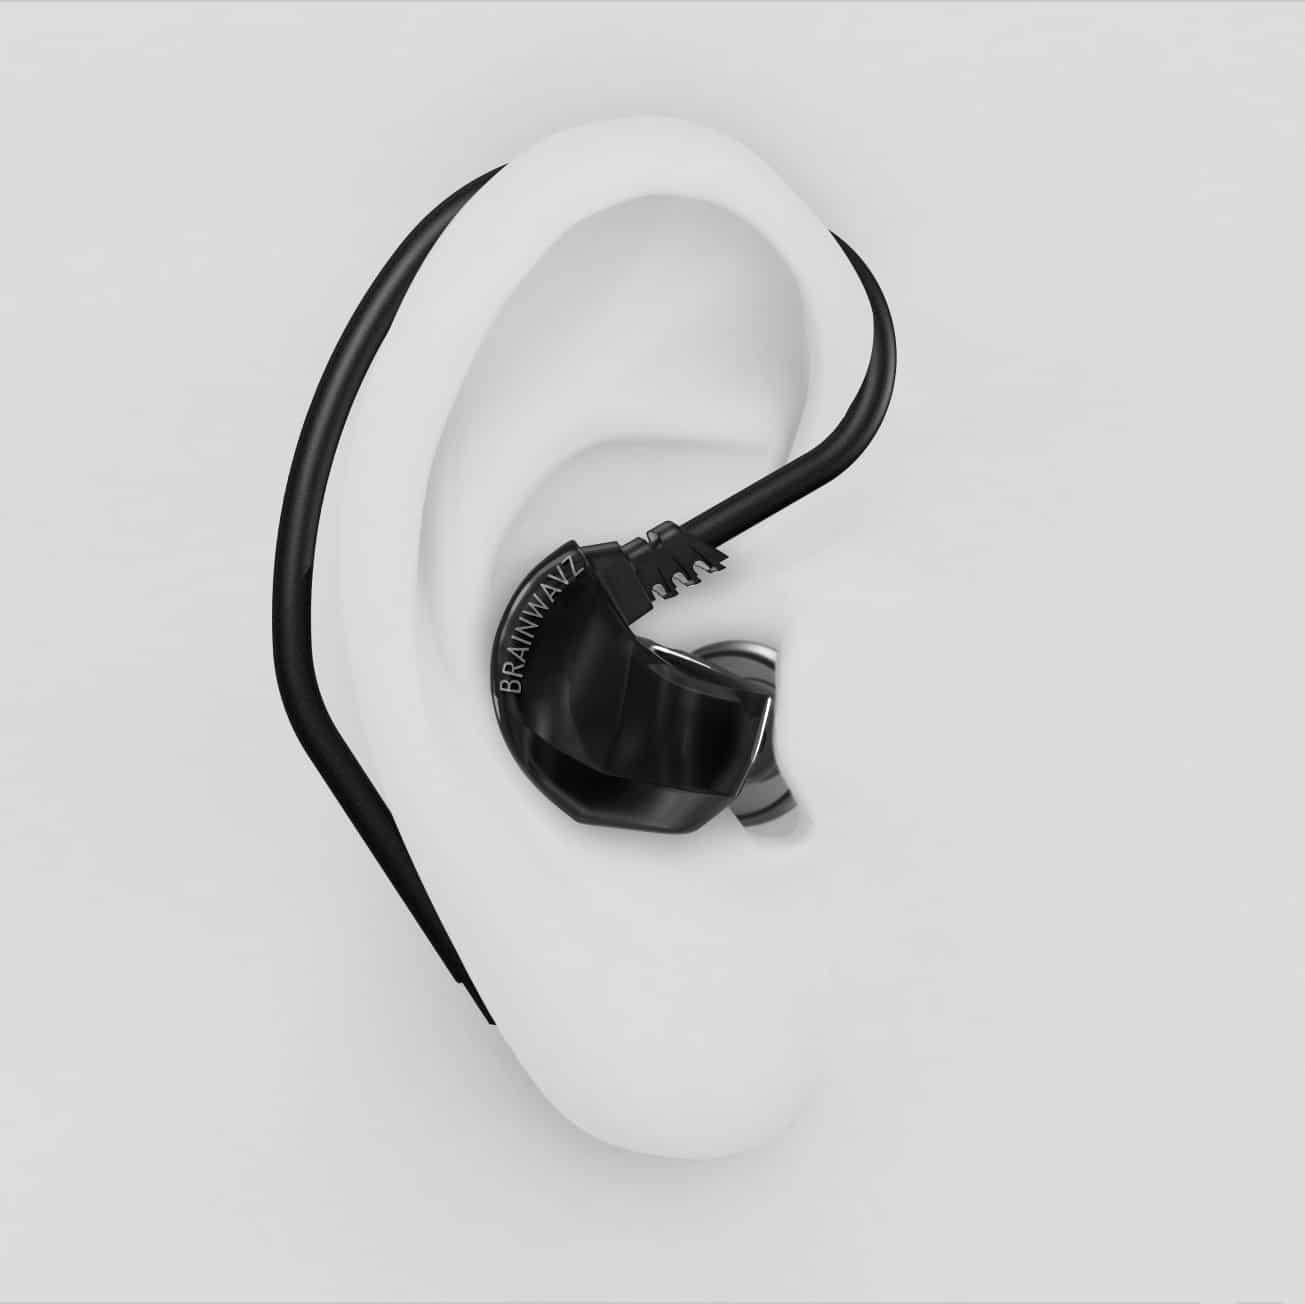 BA_in_ear_esar_white